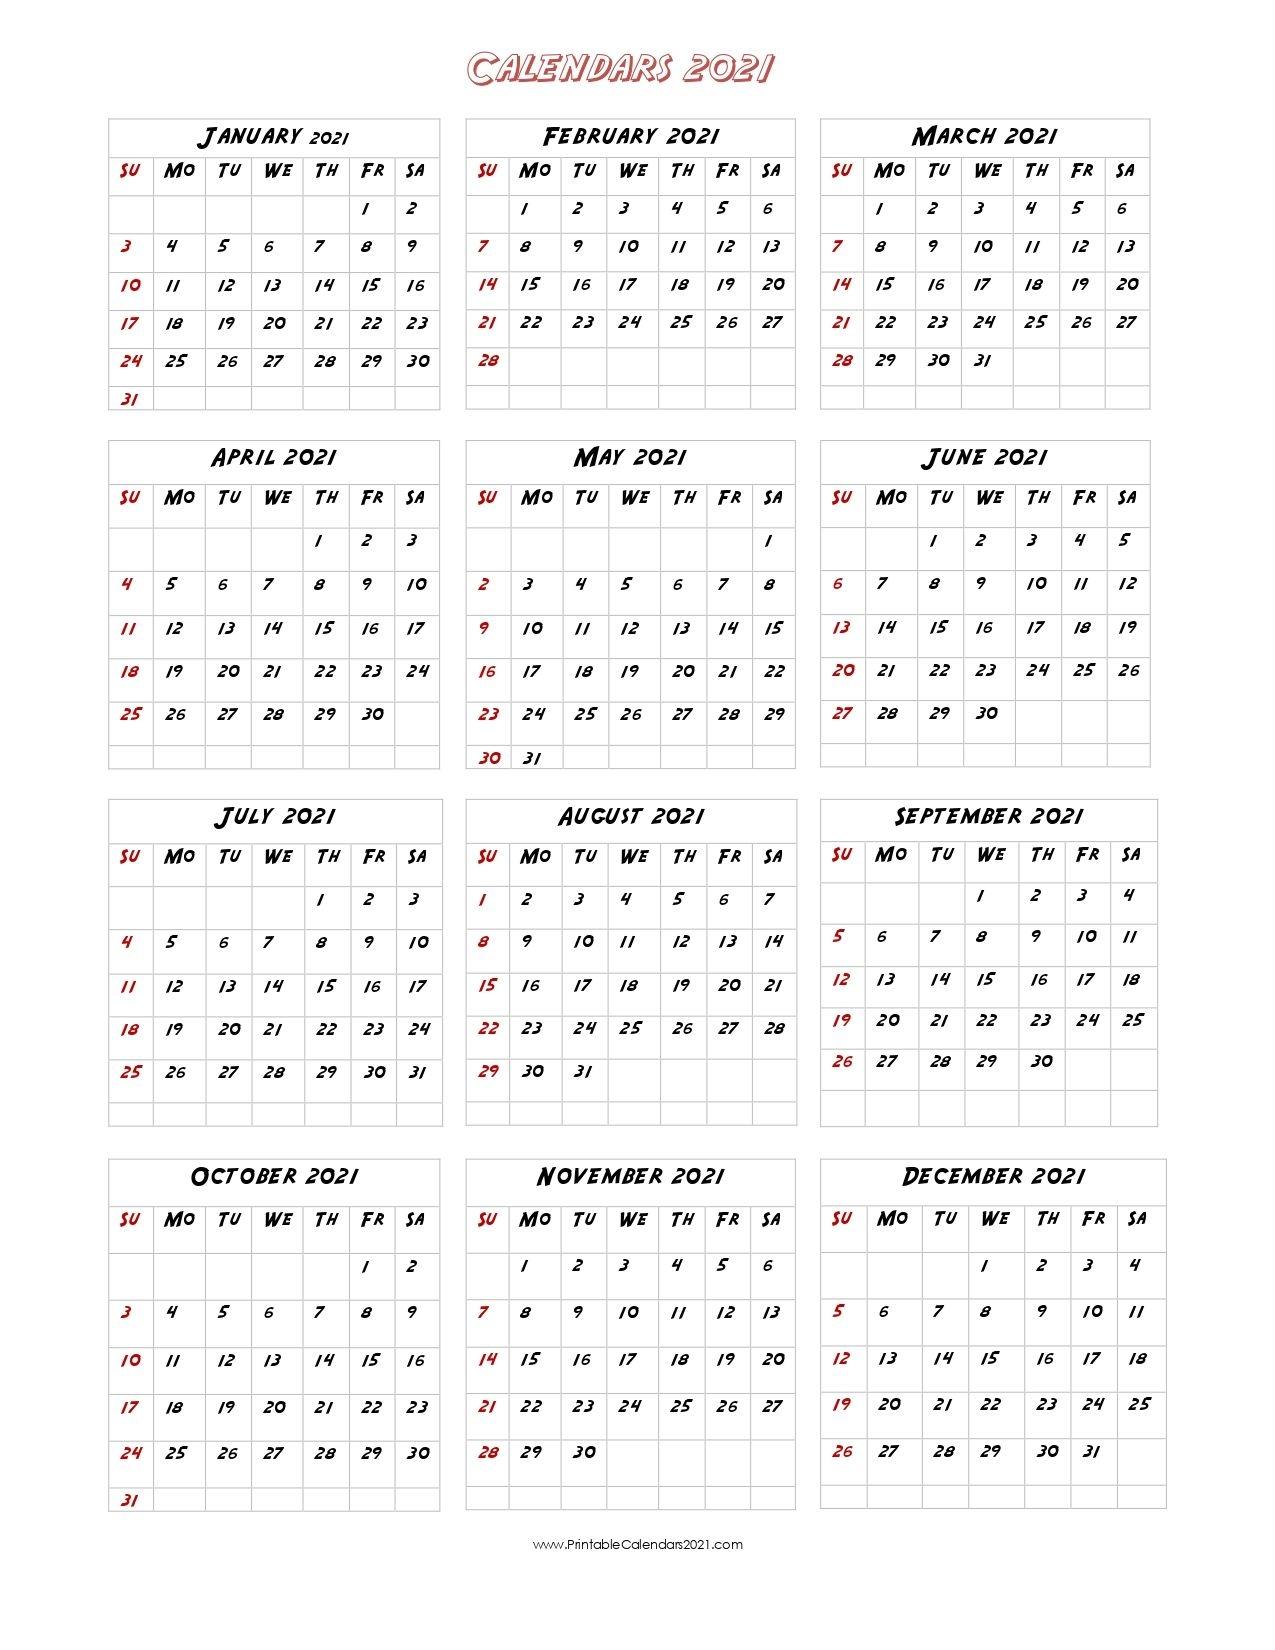 56 Printable Calendar 2021 One Page, Us 2021 Calendar